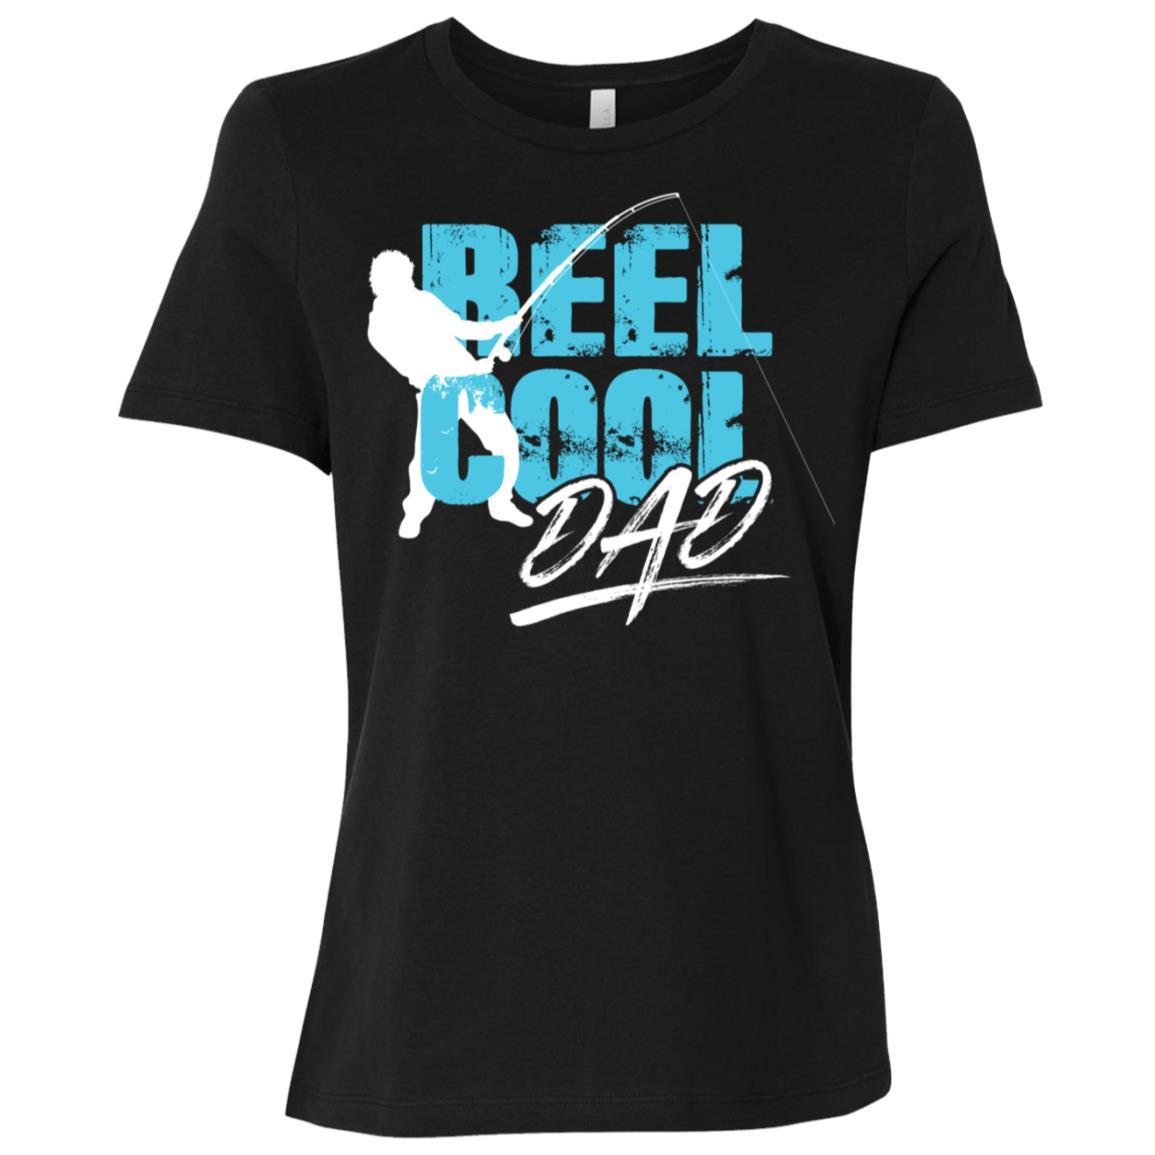 Beautiful Reel Cool Dad Fisherman Silhouette Tee Women Short Sleeve T-Shirt